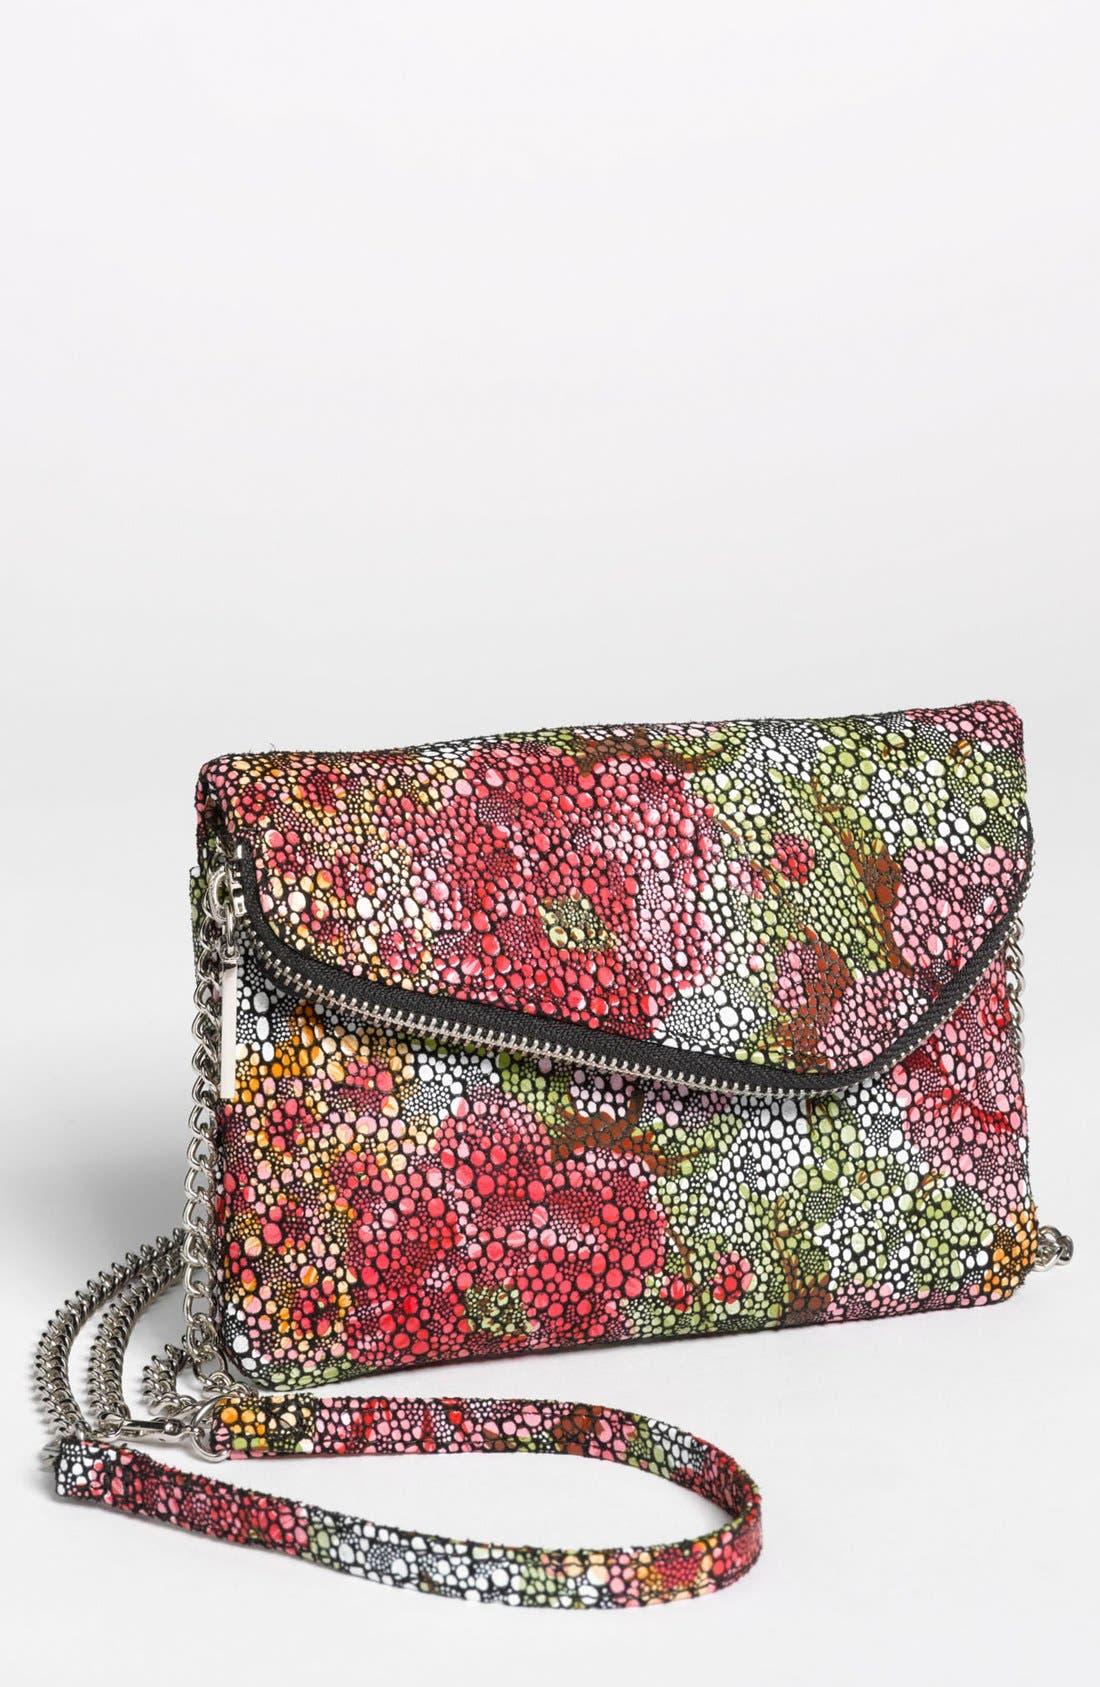 Main Image - Hobo 'Daria' Convertible Crossbody Bag, Small